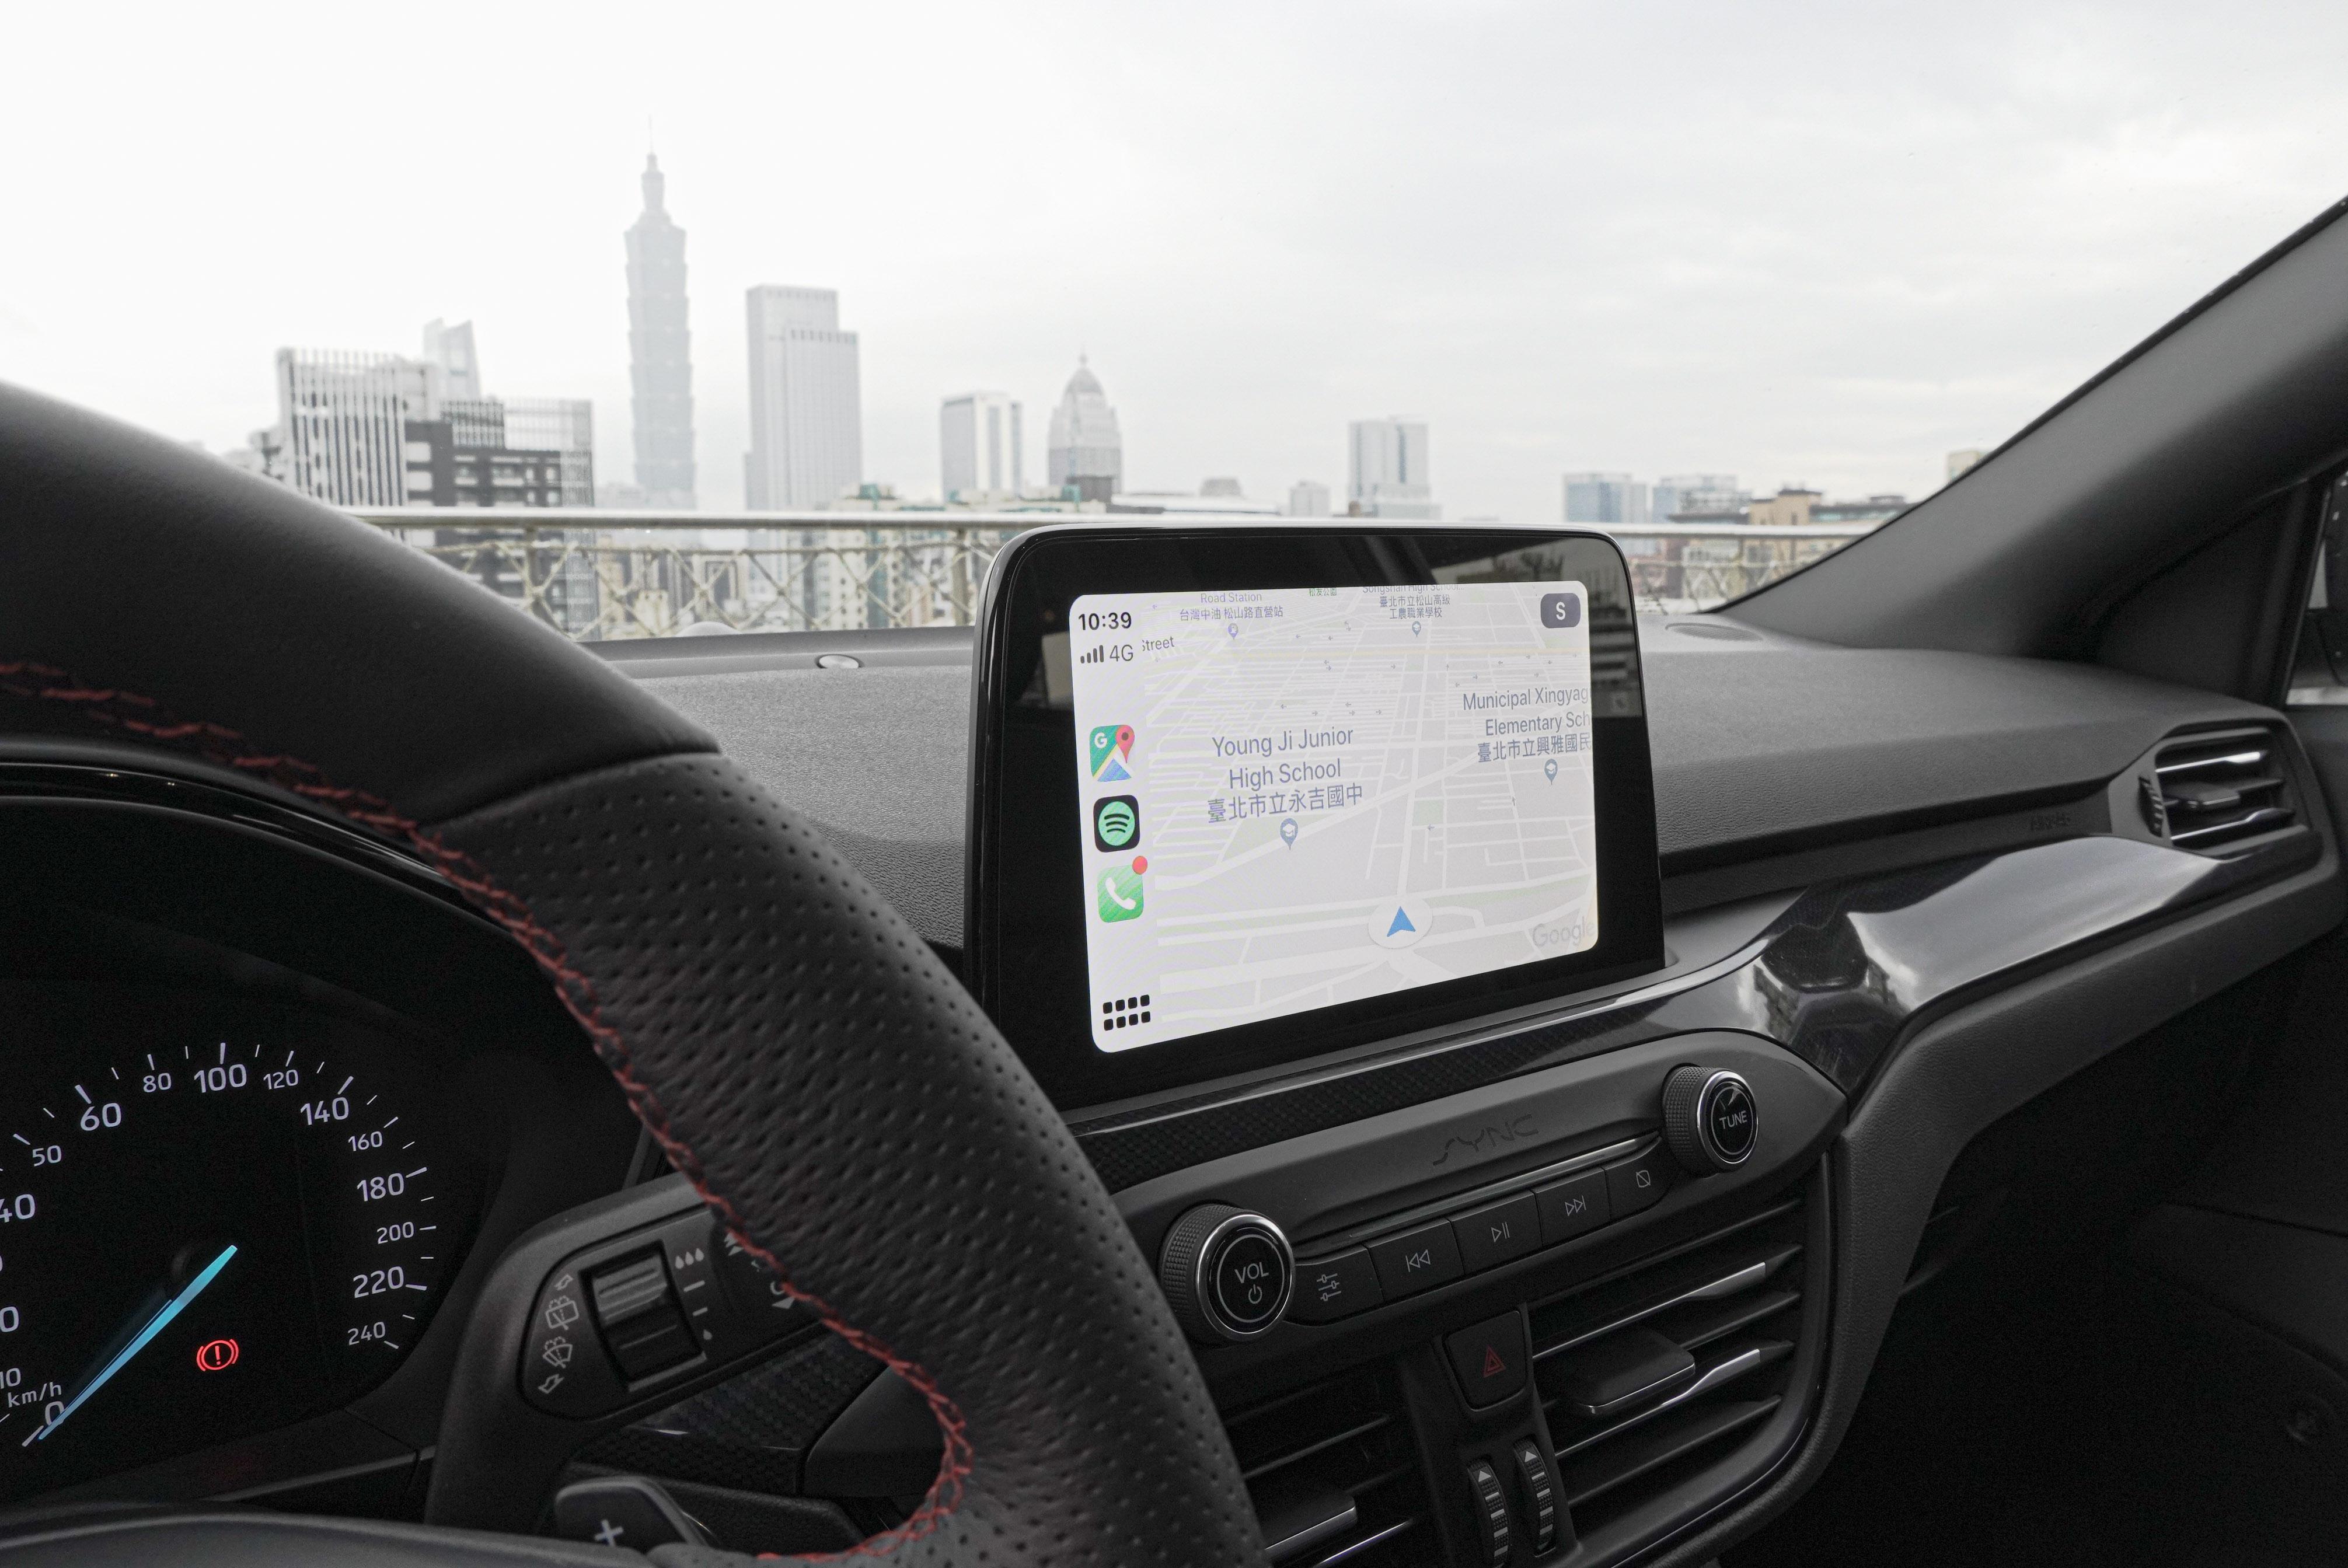 8 吋懸浮式全彩 LCD 觸控螢幕支援 Apple CarPlay、Android Auto。